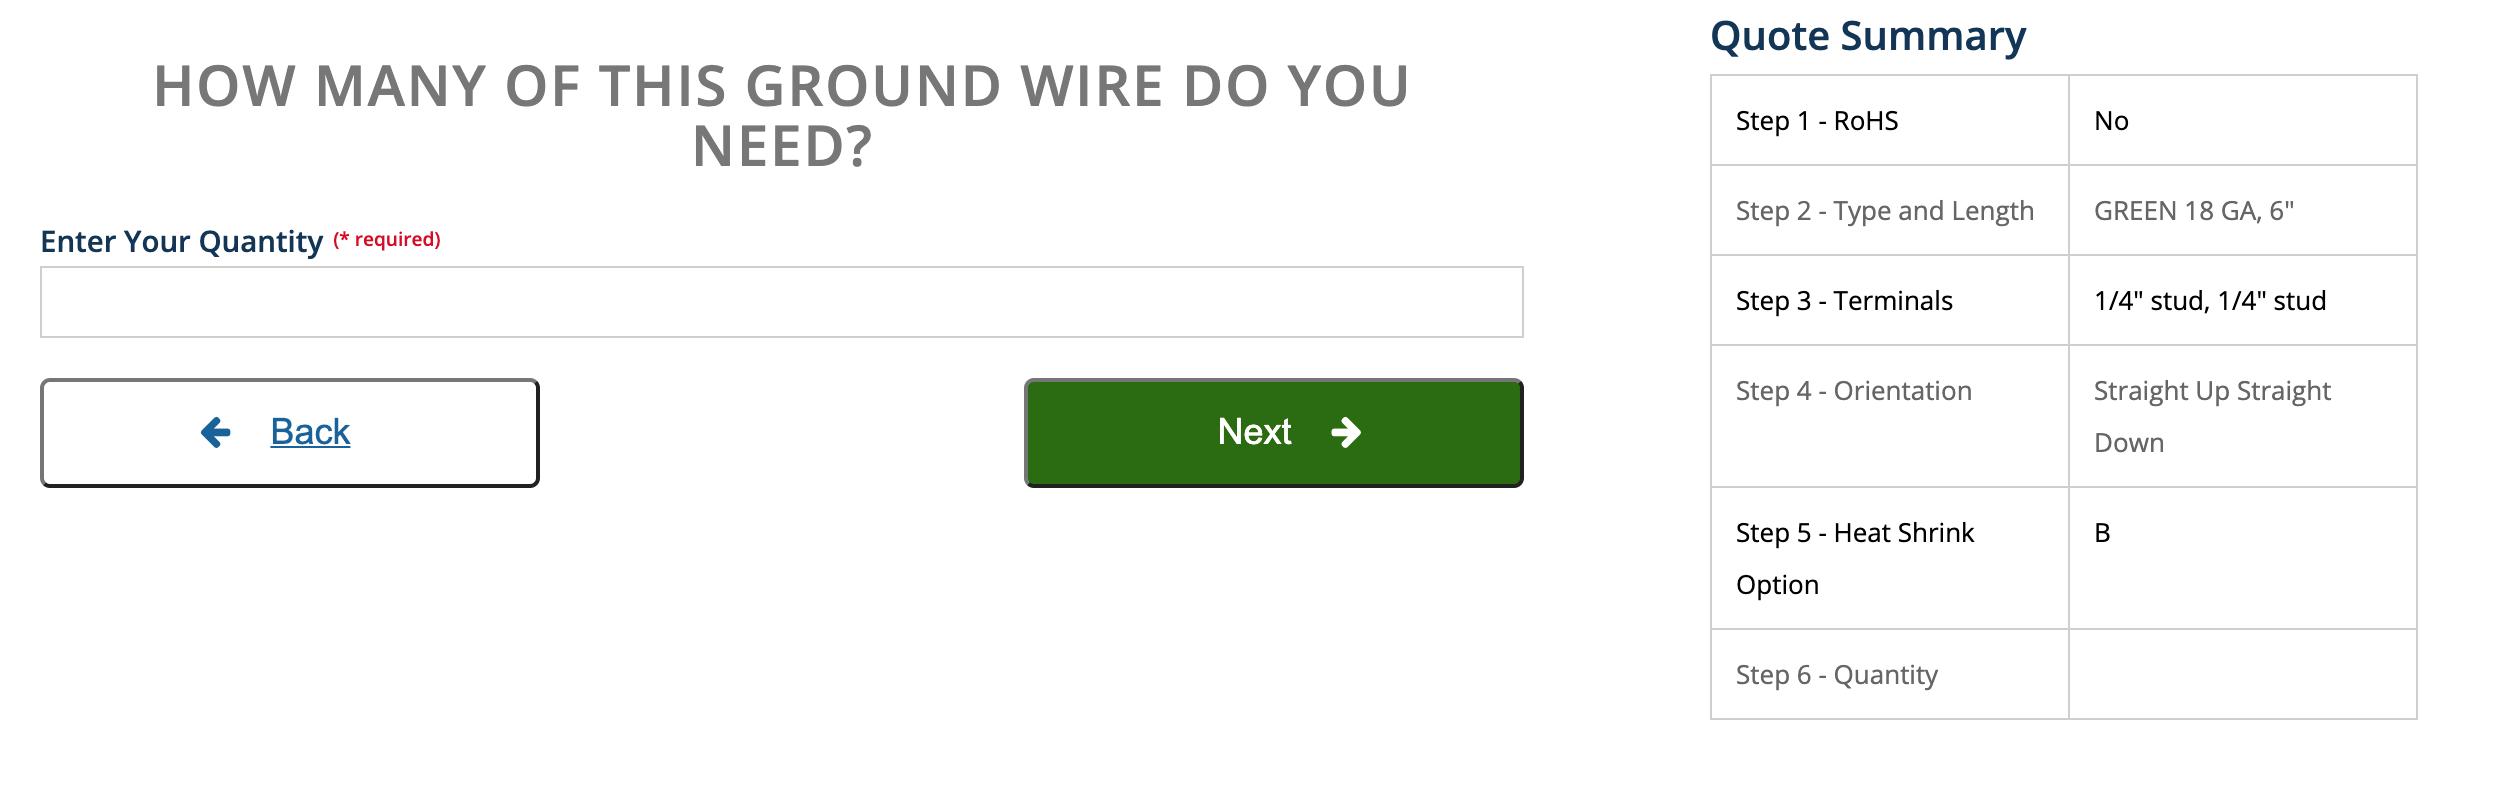 Instant Ground Wire QuoteBuilder, Falconer Electronics Strikes Again! Instant Ground Wire QuoteBuilder